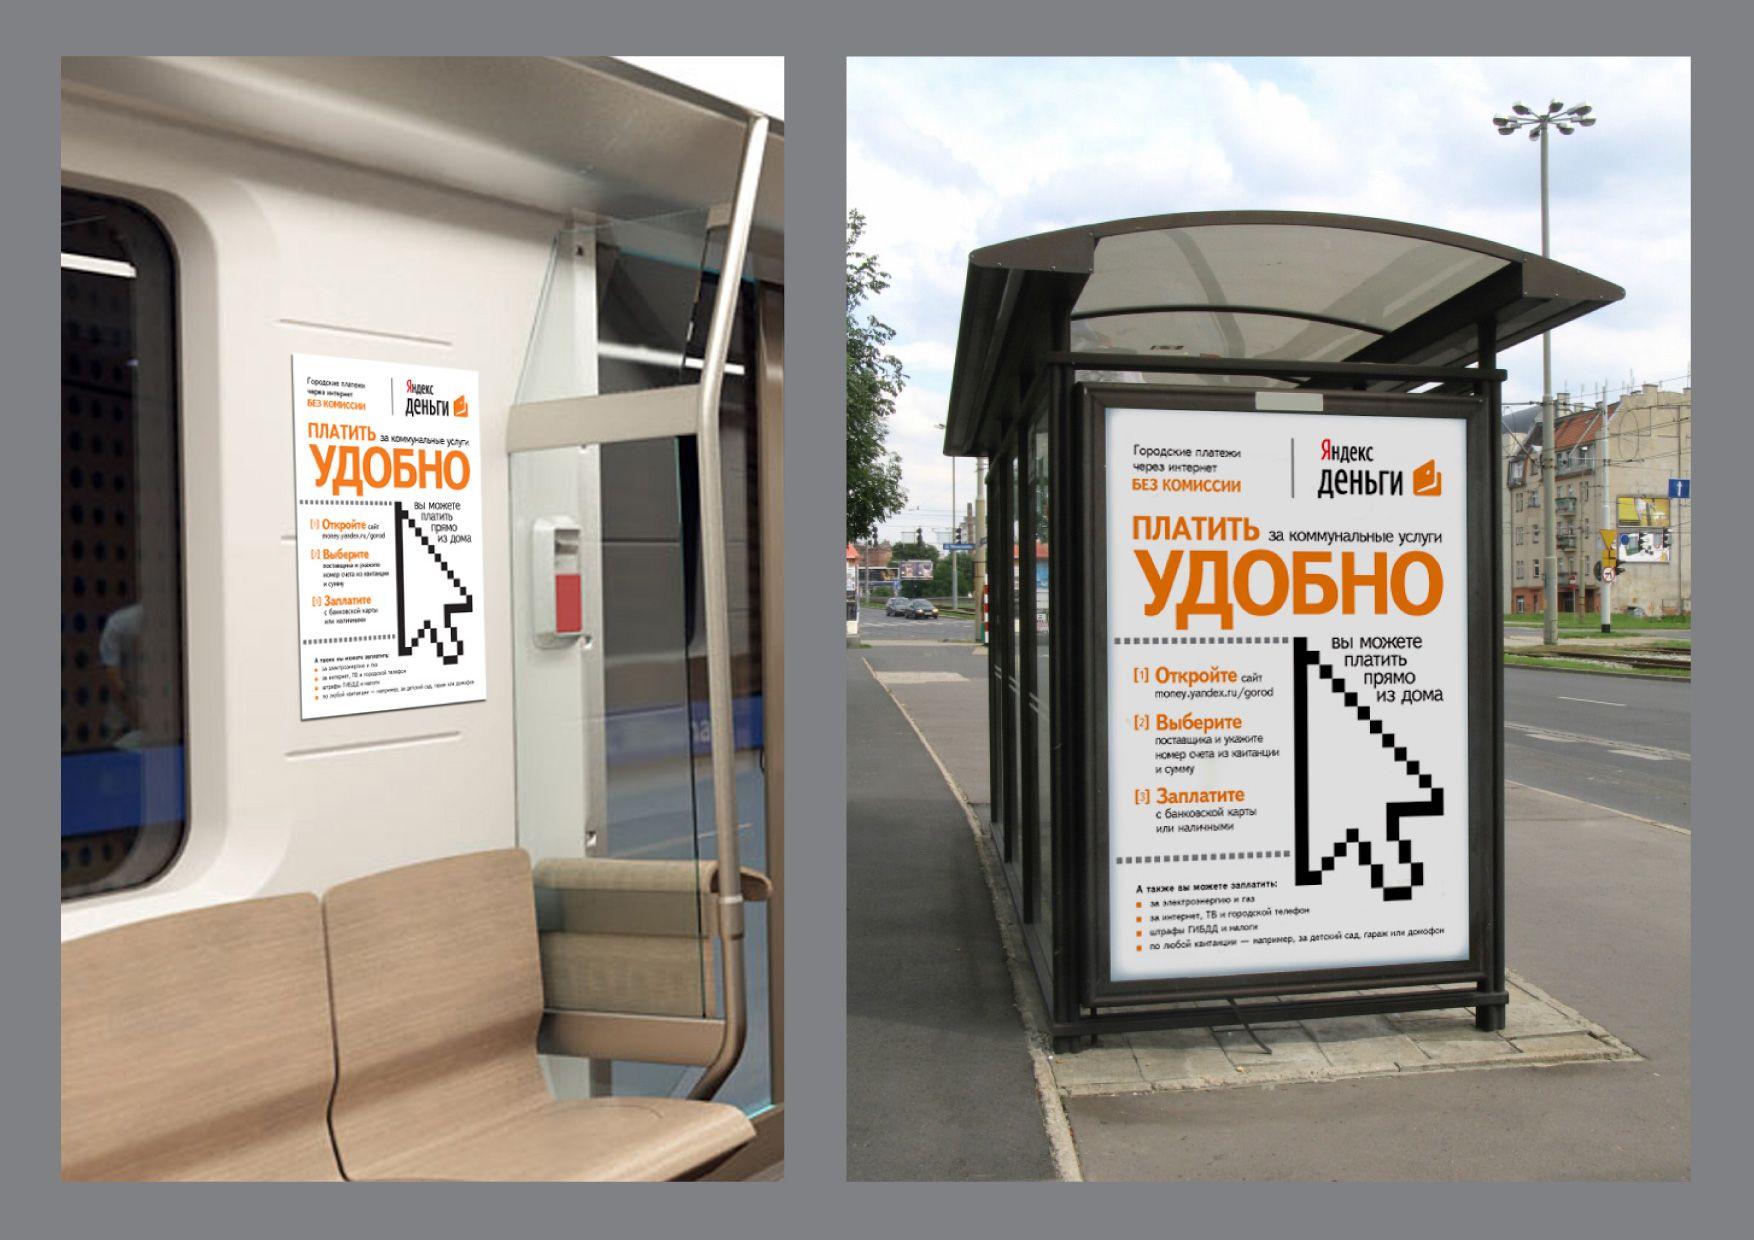 Реклама Яндекс.Денег для оплаты ЖКХ - дизайнер igor_kireyev